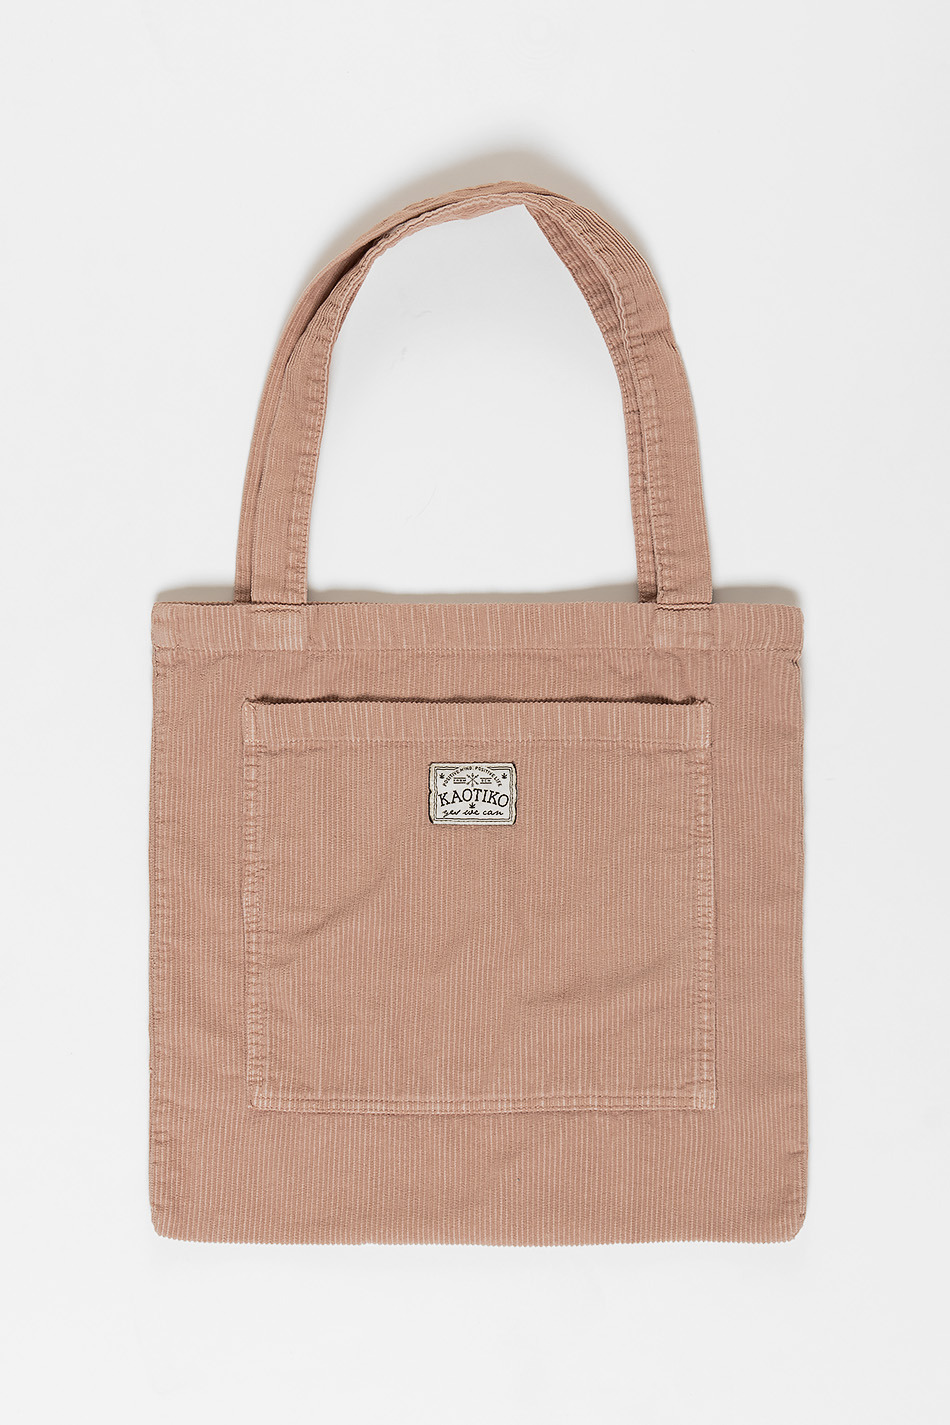 Tote Bag Corduroy Rose